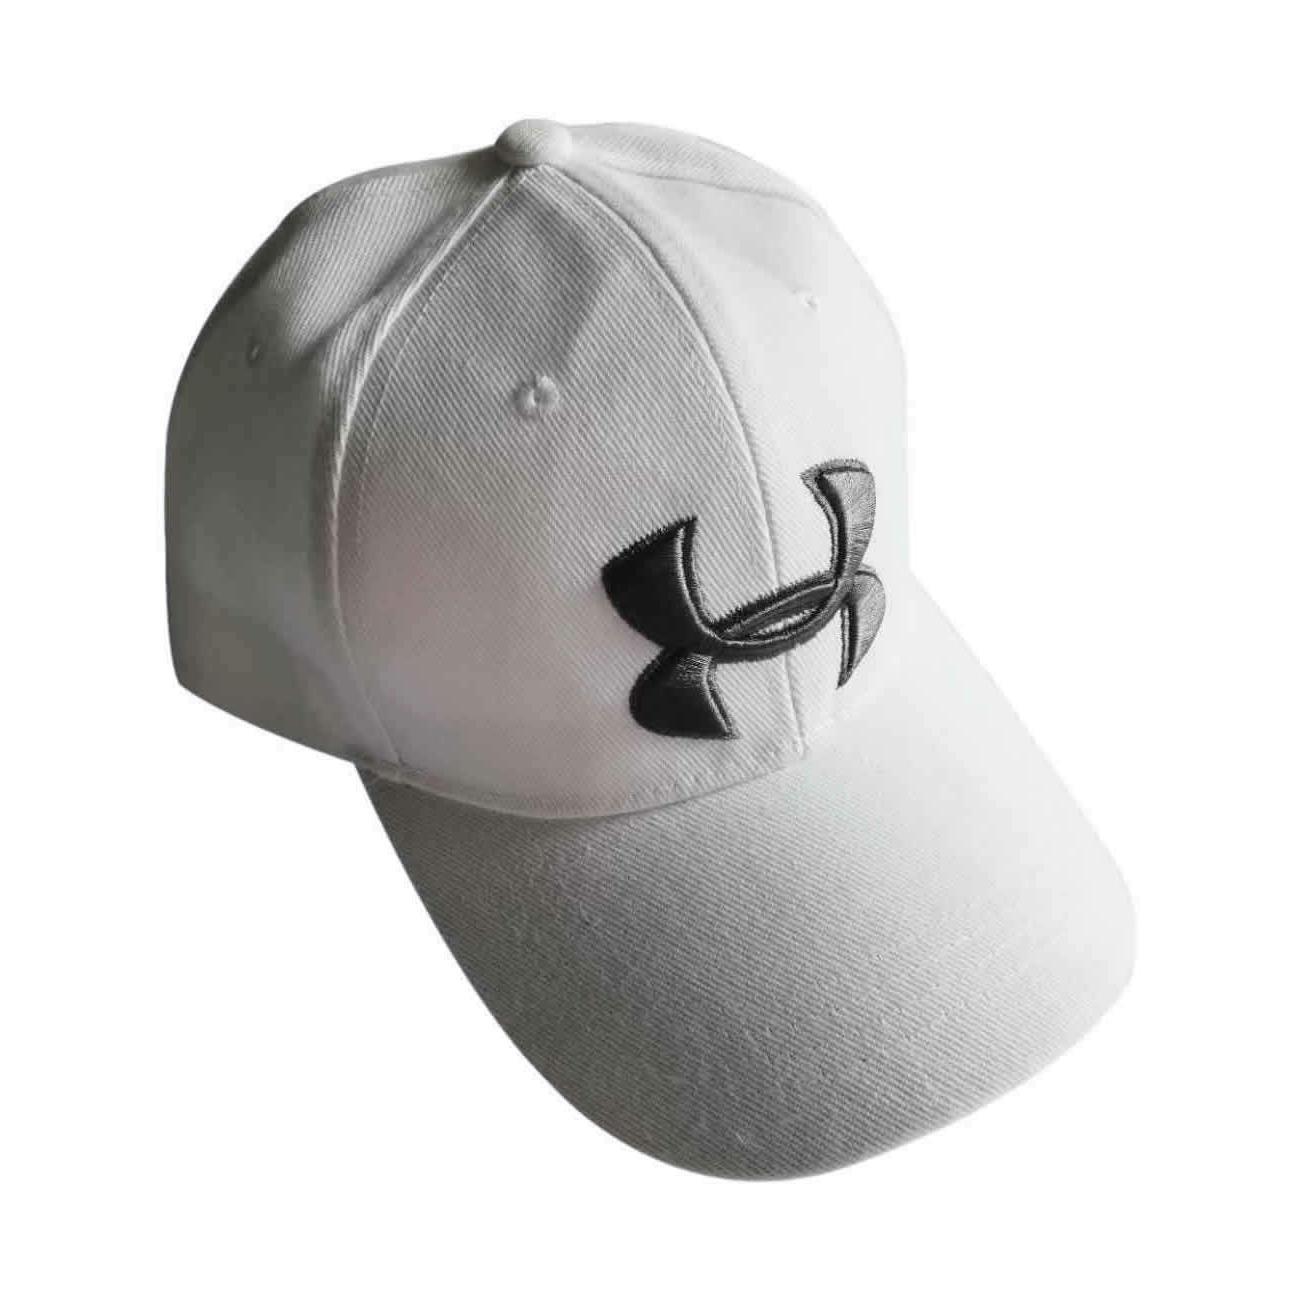 Golf Baseball Cap Embroidered Unisex Women